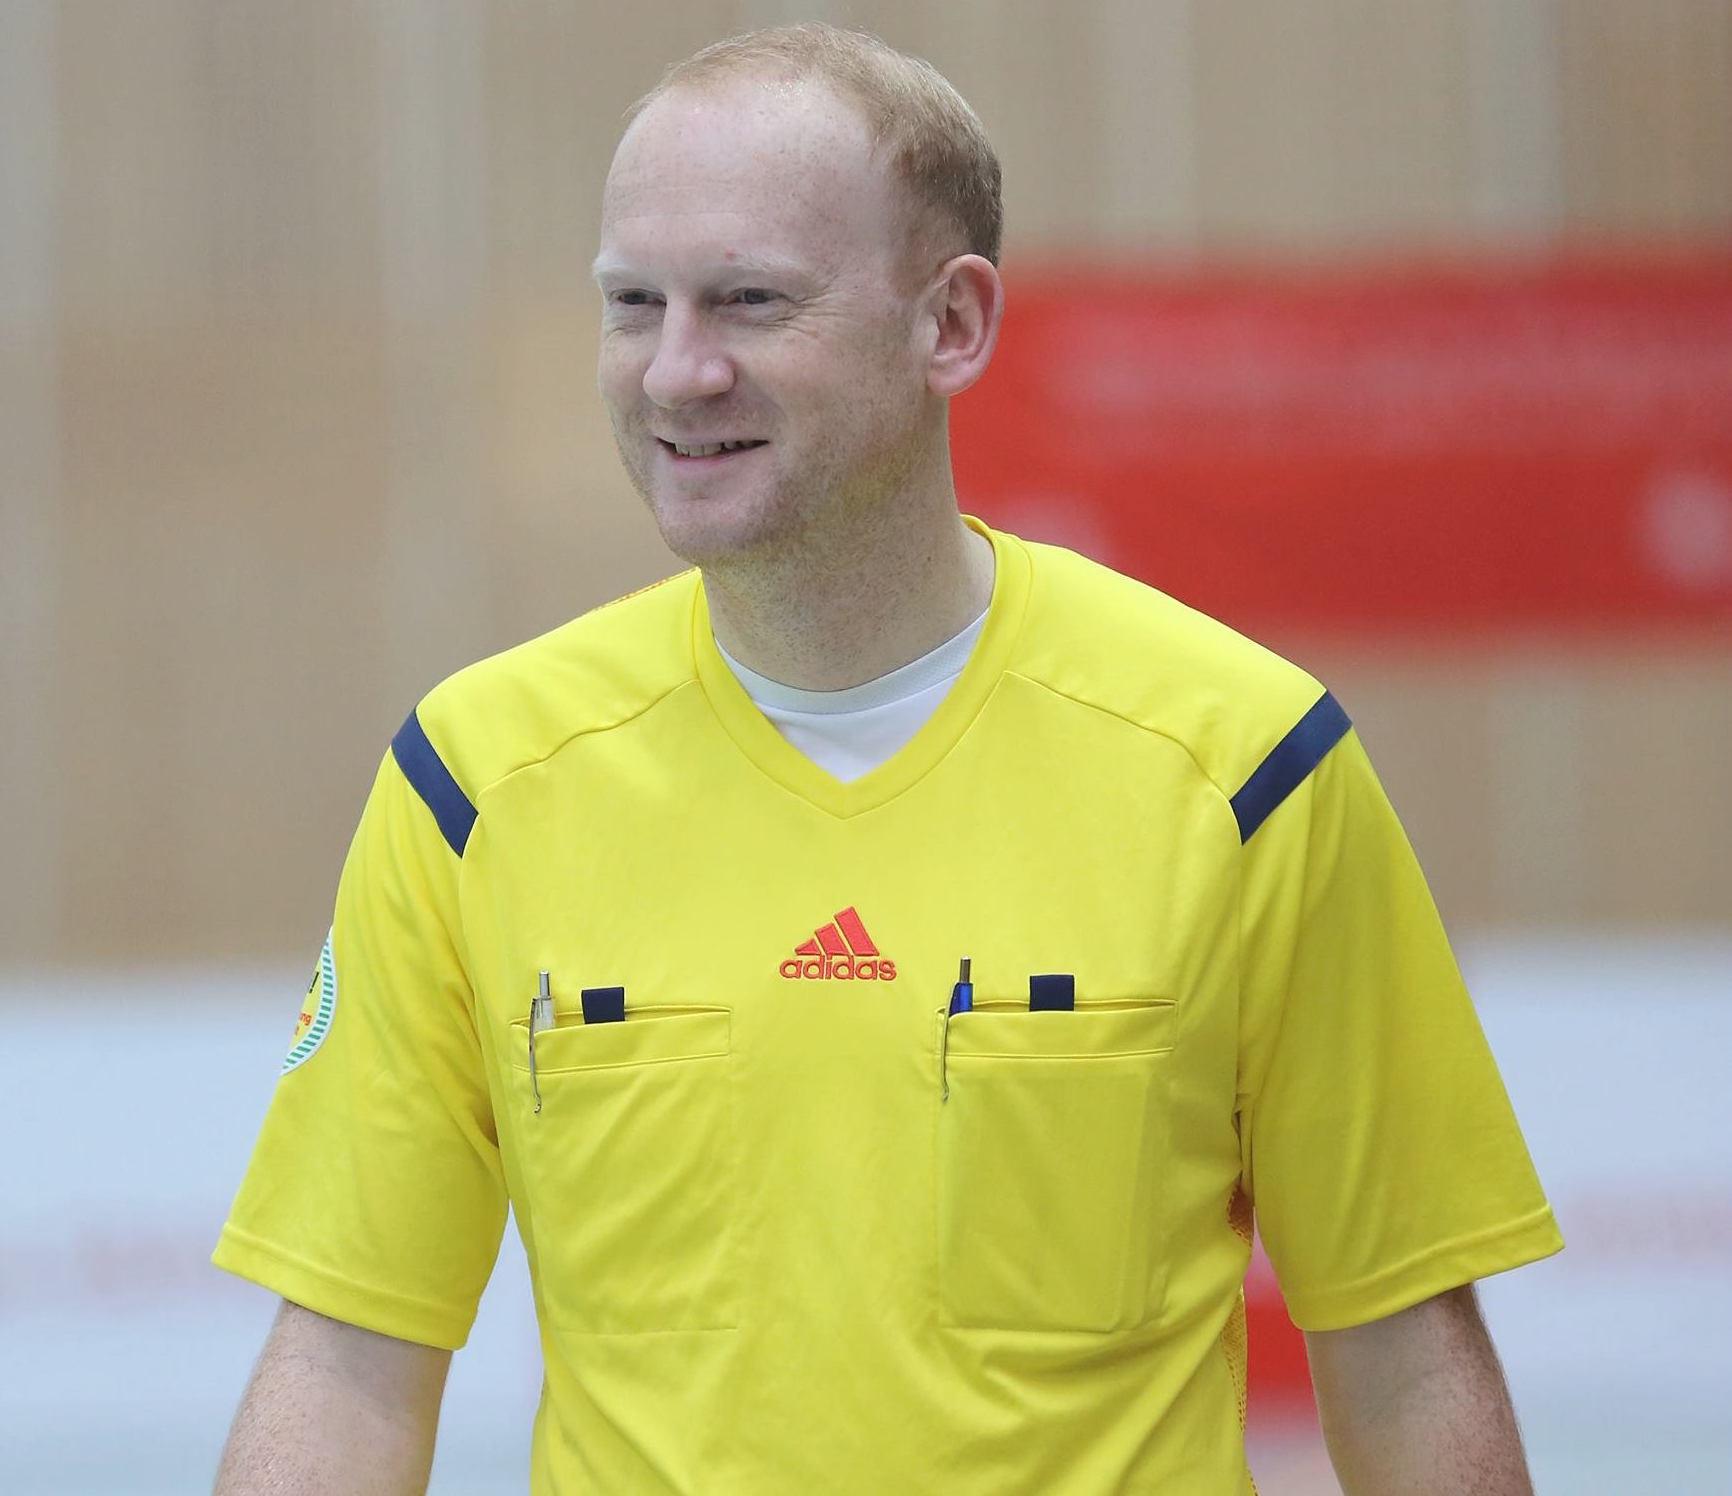 regeltest schiedsrichter 2017 handball